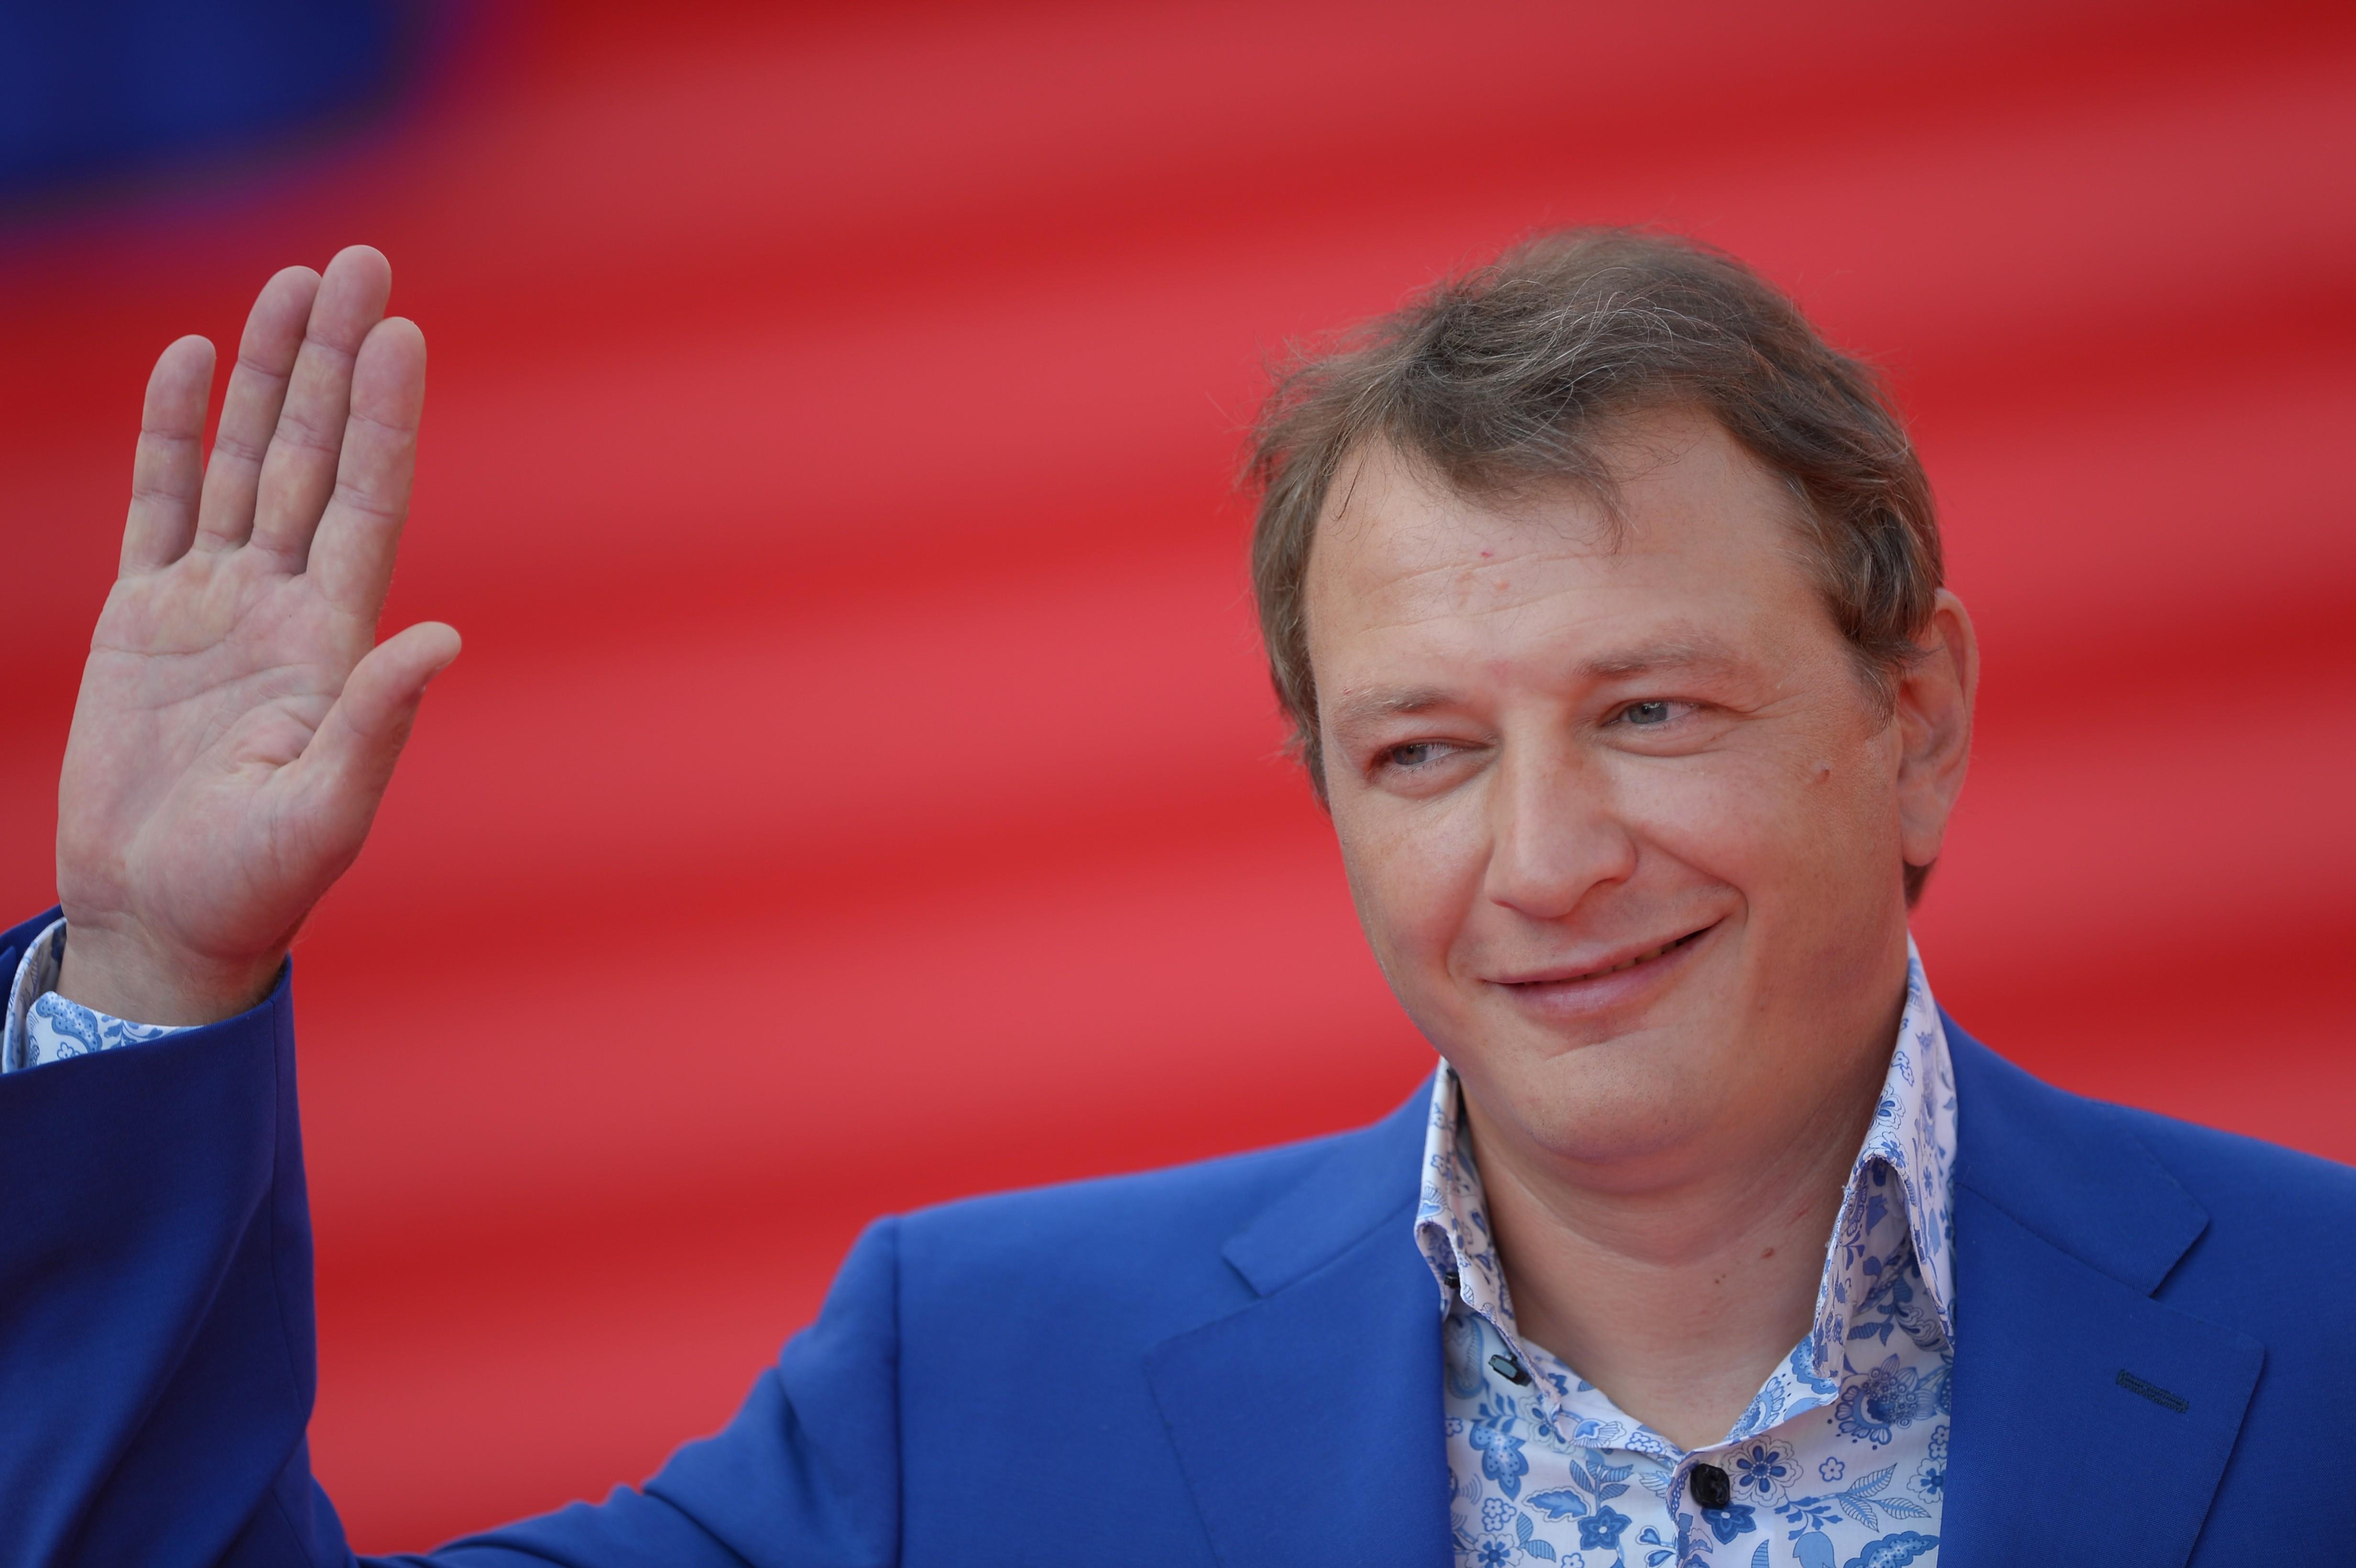 <p><span>Фото: &copy; РИА Новости/Евгения Новоженина</span></p>